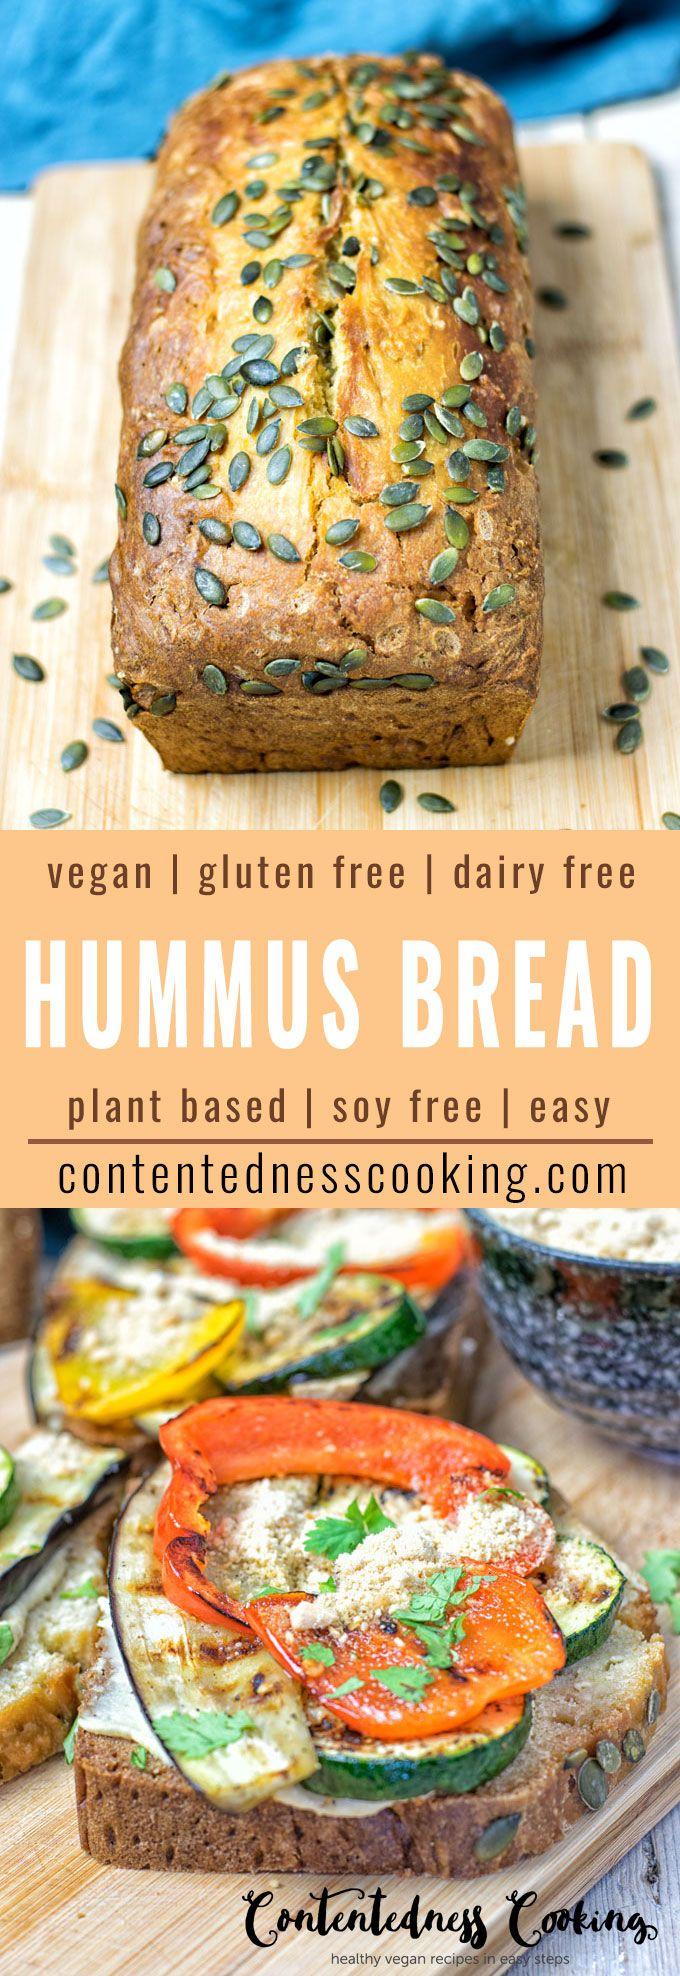 Hummus Homemade Bread | #vegan #glutenfree #contentednesscooking #soyfree #plantbased #dairyfree